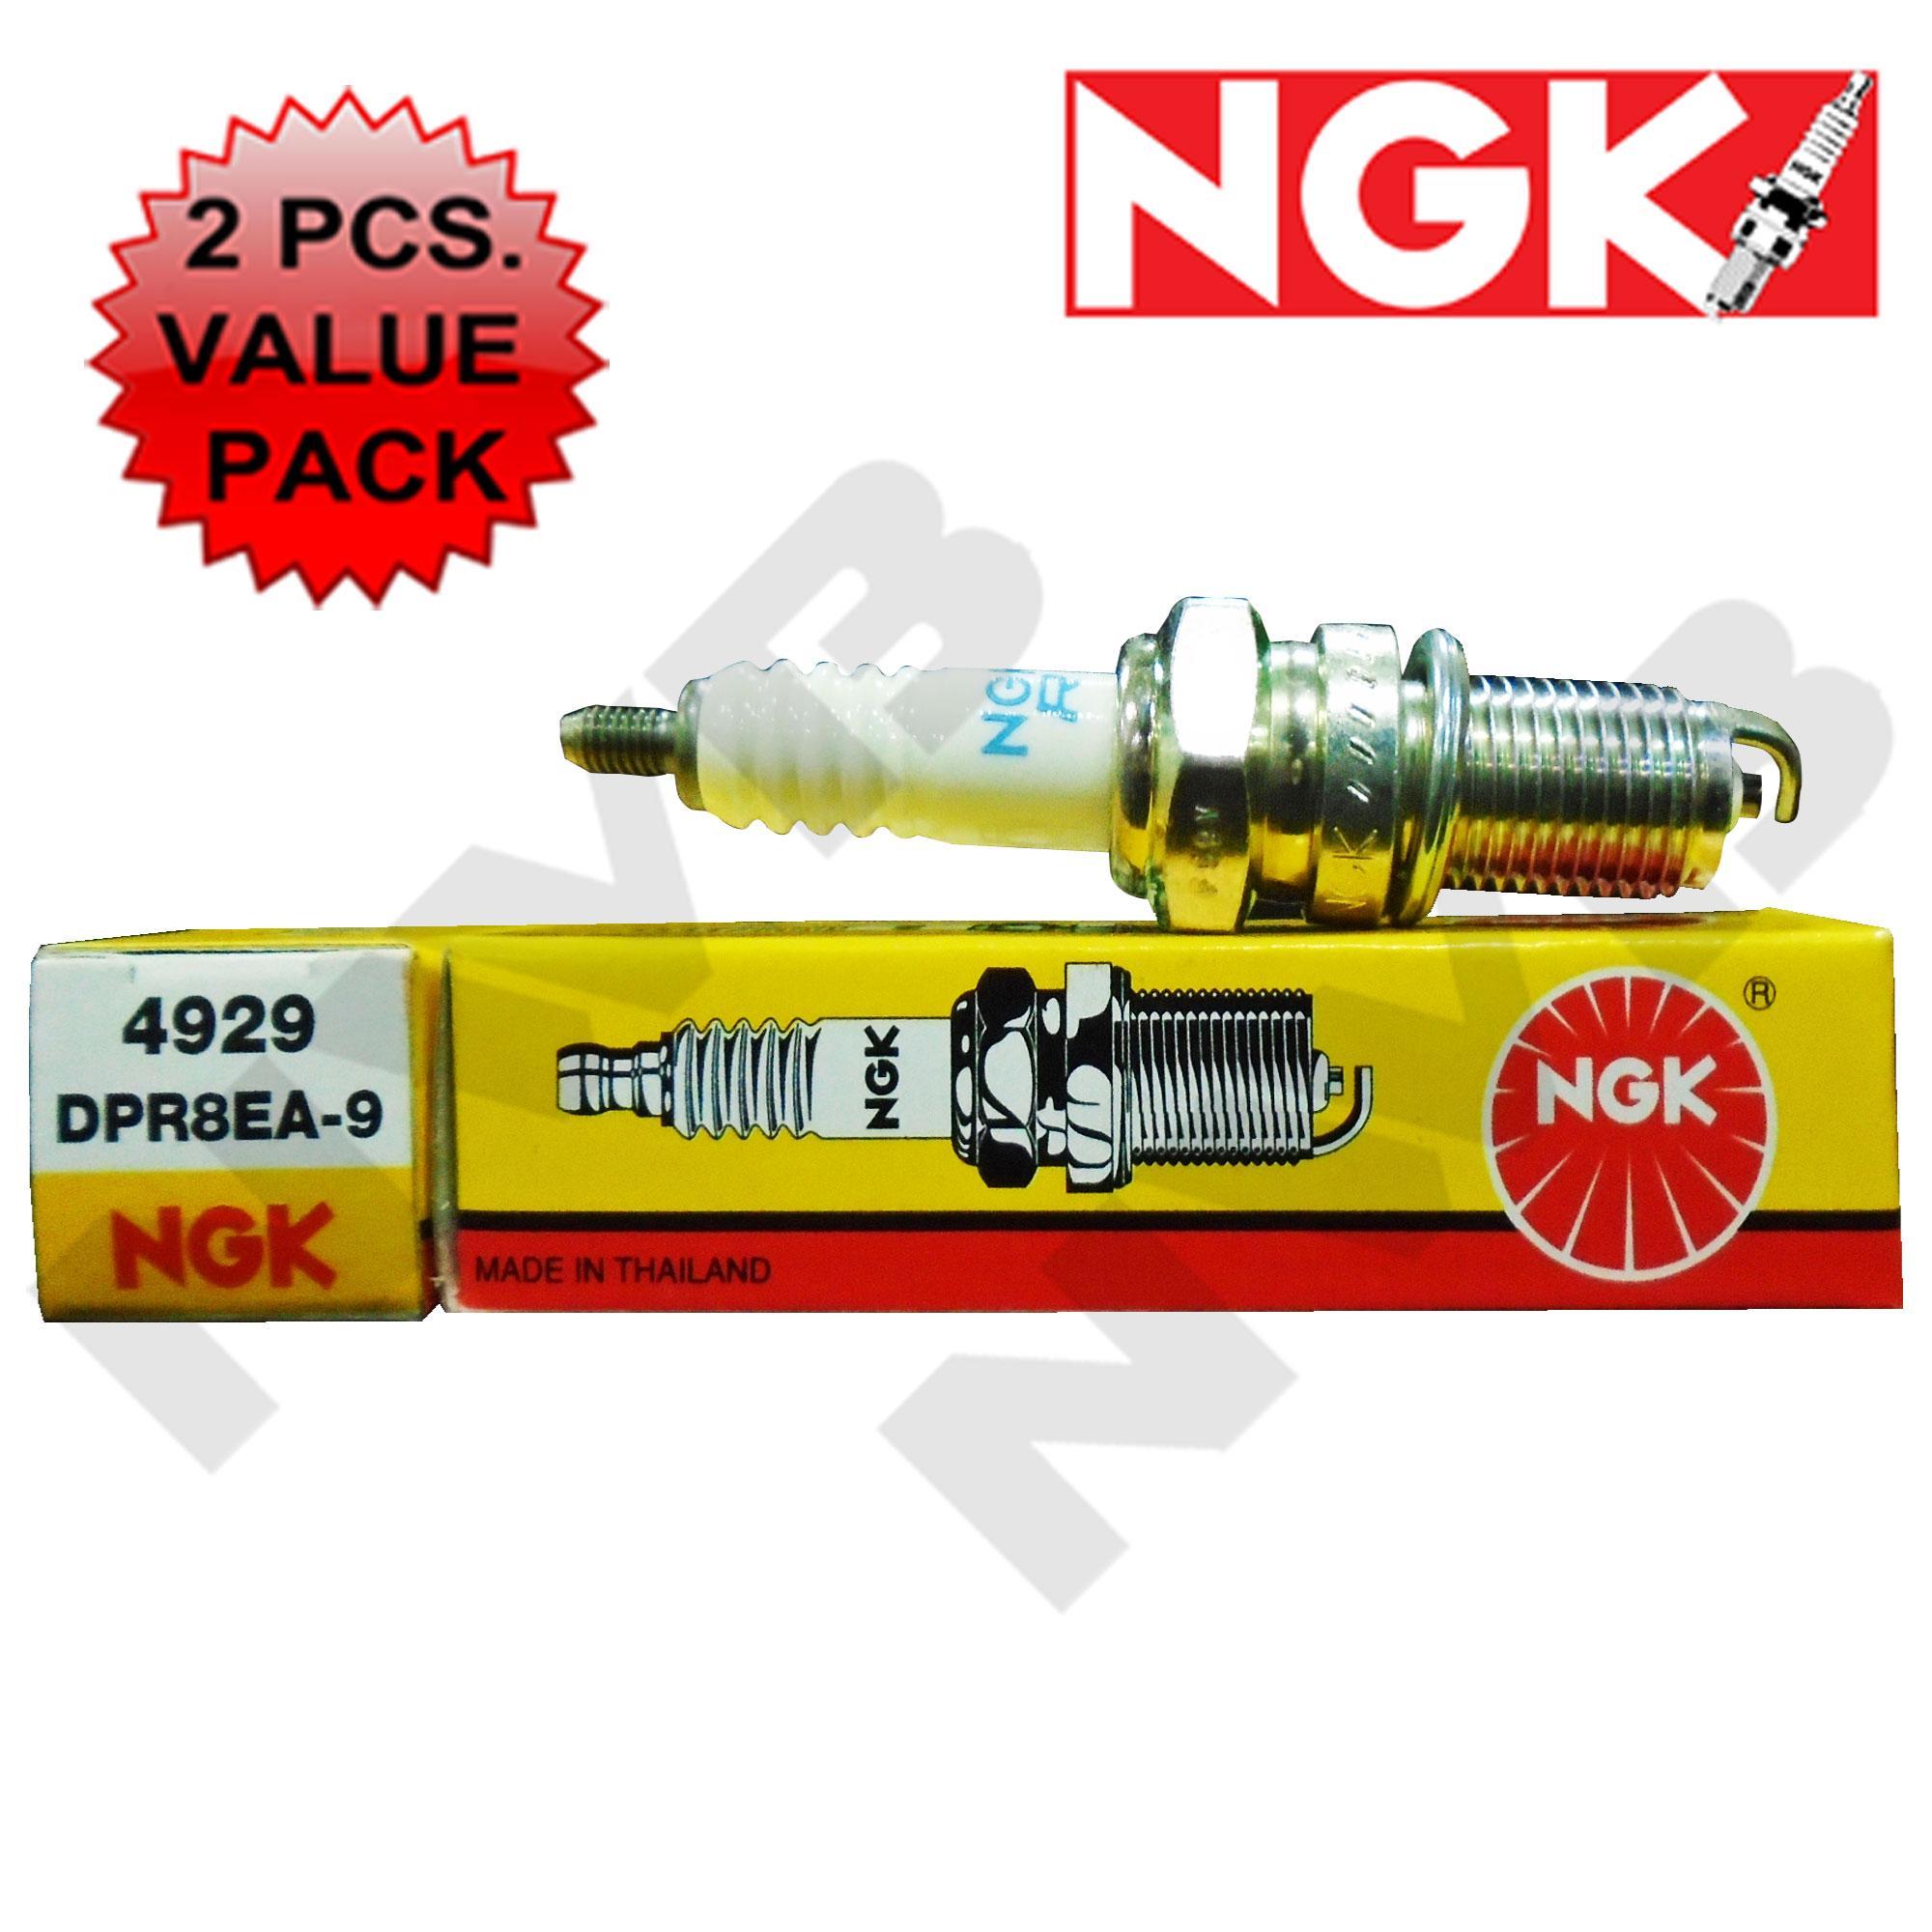 Ngk Dpr8ea-9 Spark Plug 2pcs. Value Pack By Nwb Wiper Blade.